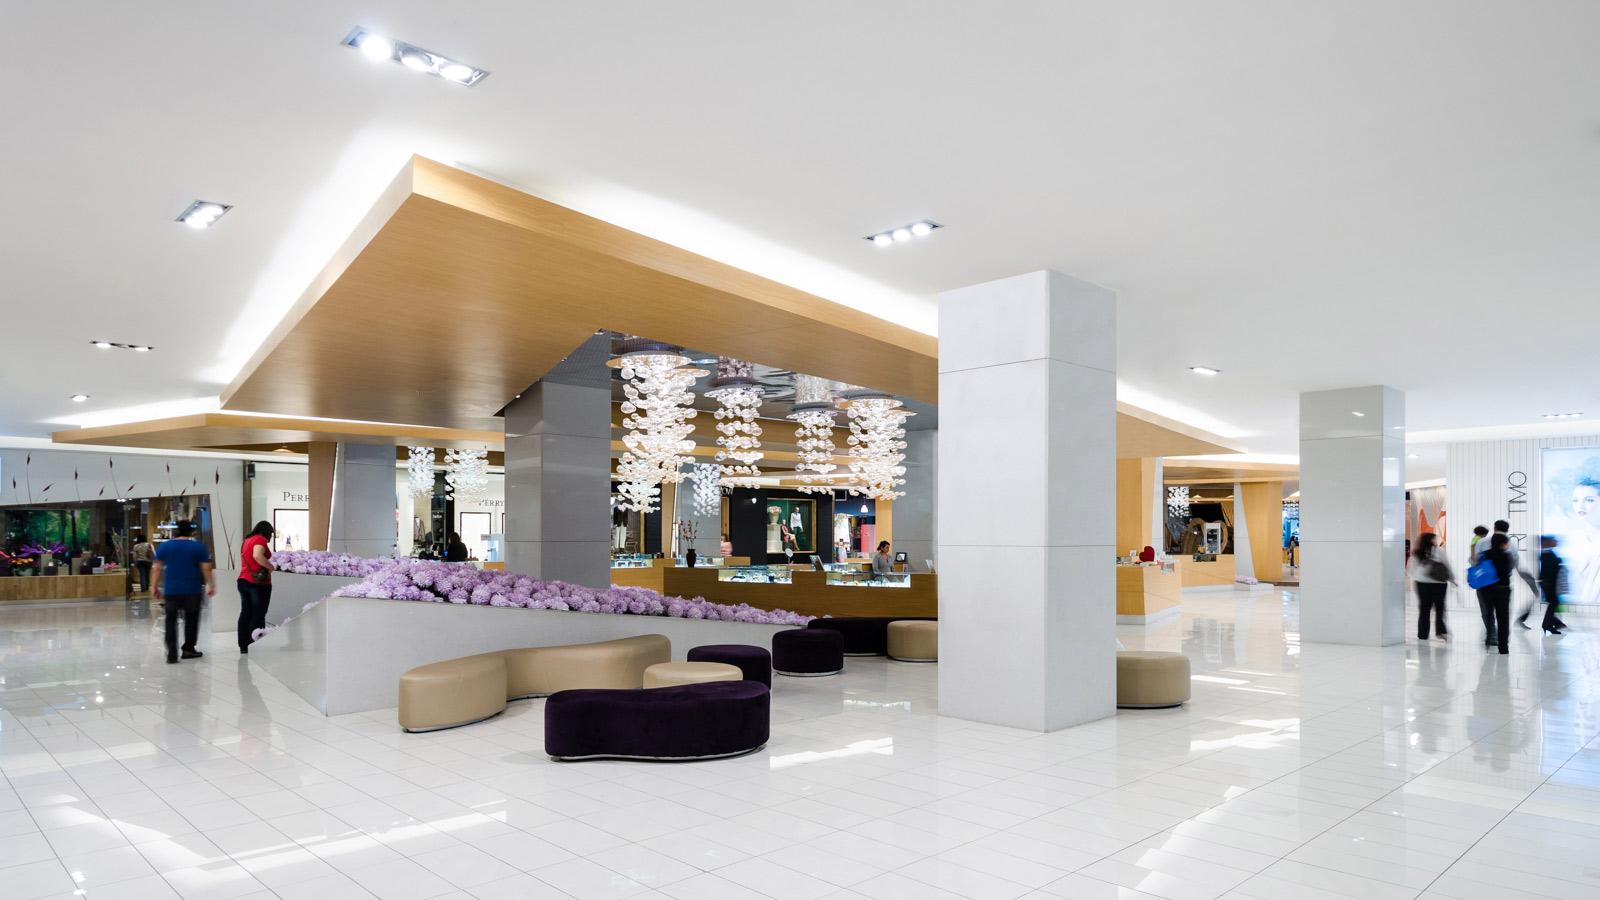 Man Cave Store Coastal Grand Mall : Mall plaza antofagasta aires bliss fasman